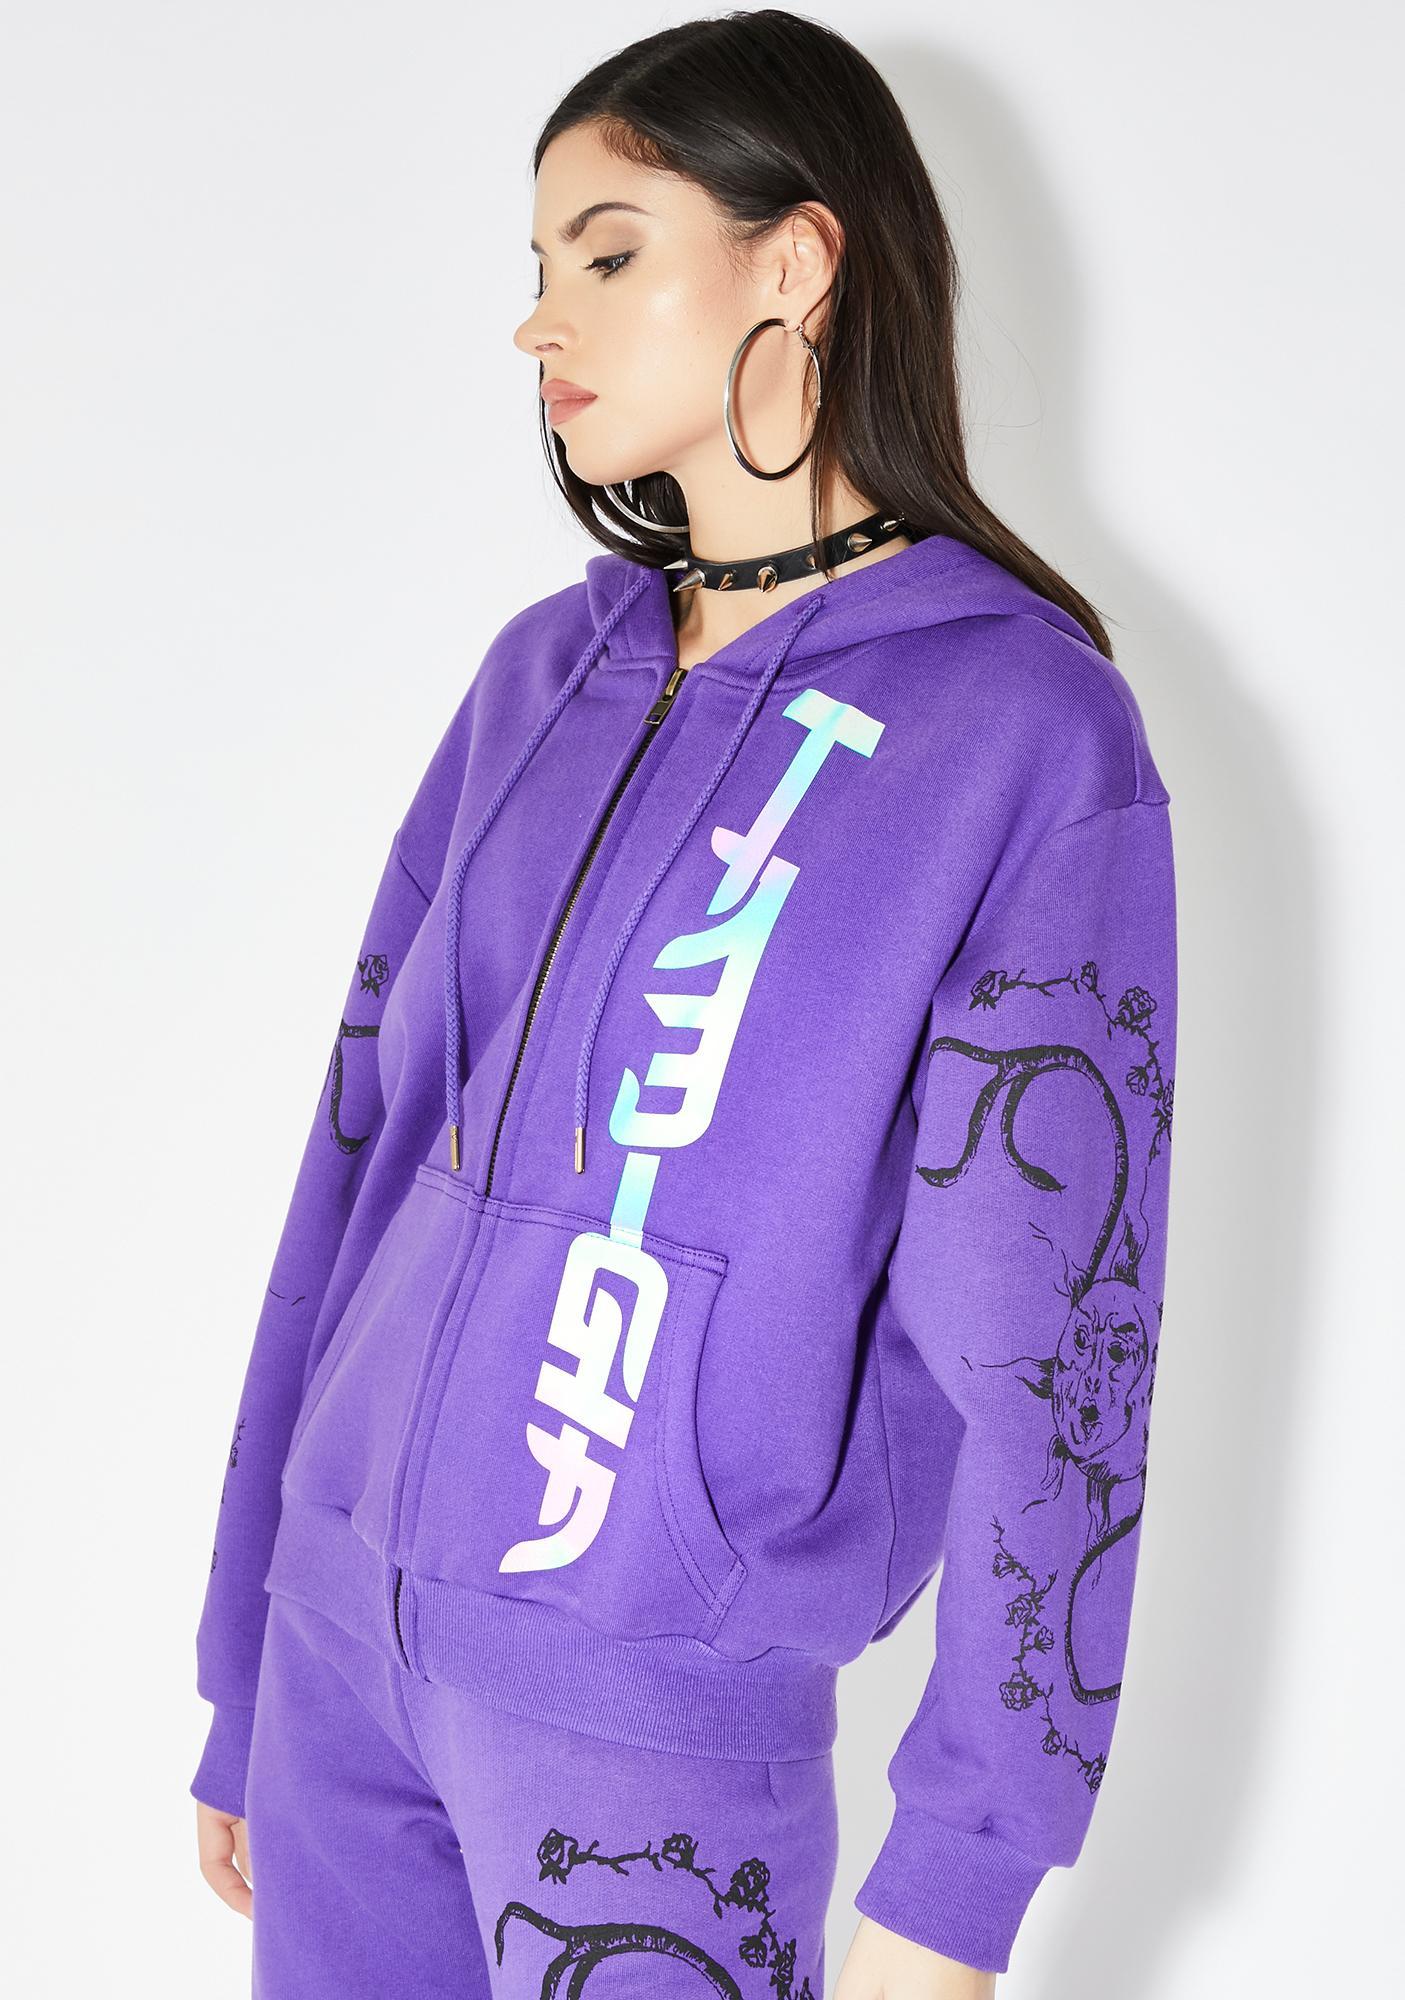 I AM GIA Astrea Reflective Jacket